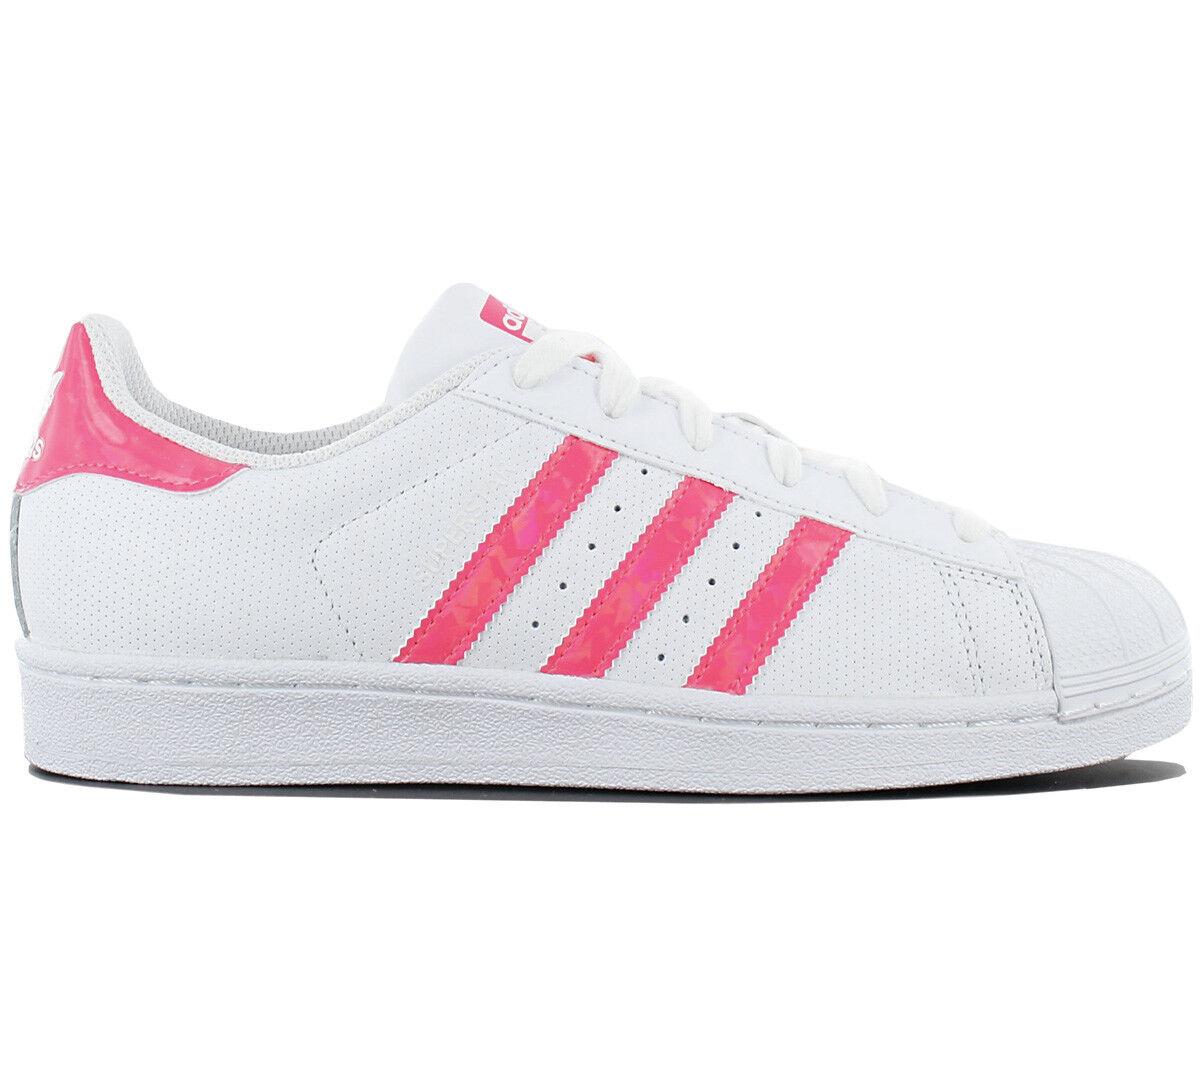 cheaper a6356 5e8b8 ... Adidas Originals Superstar 2 80s Turnschuhe Schuhe Schuhe Schuhe Retro  Turnschuhe Sportschuhe NEU 85d38c